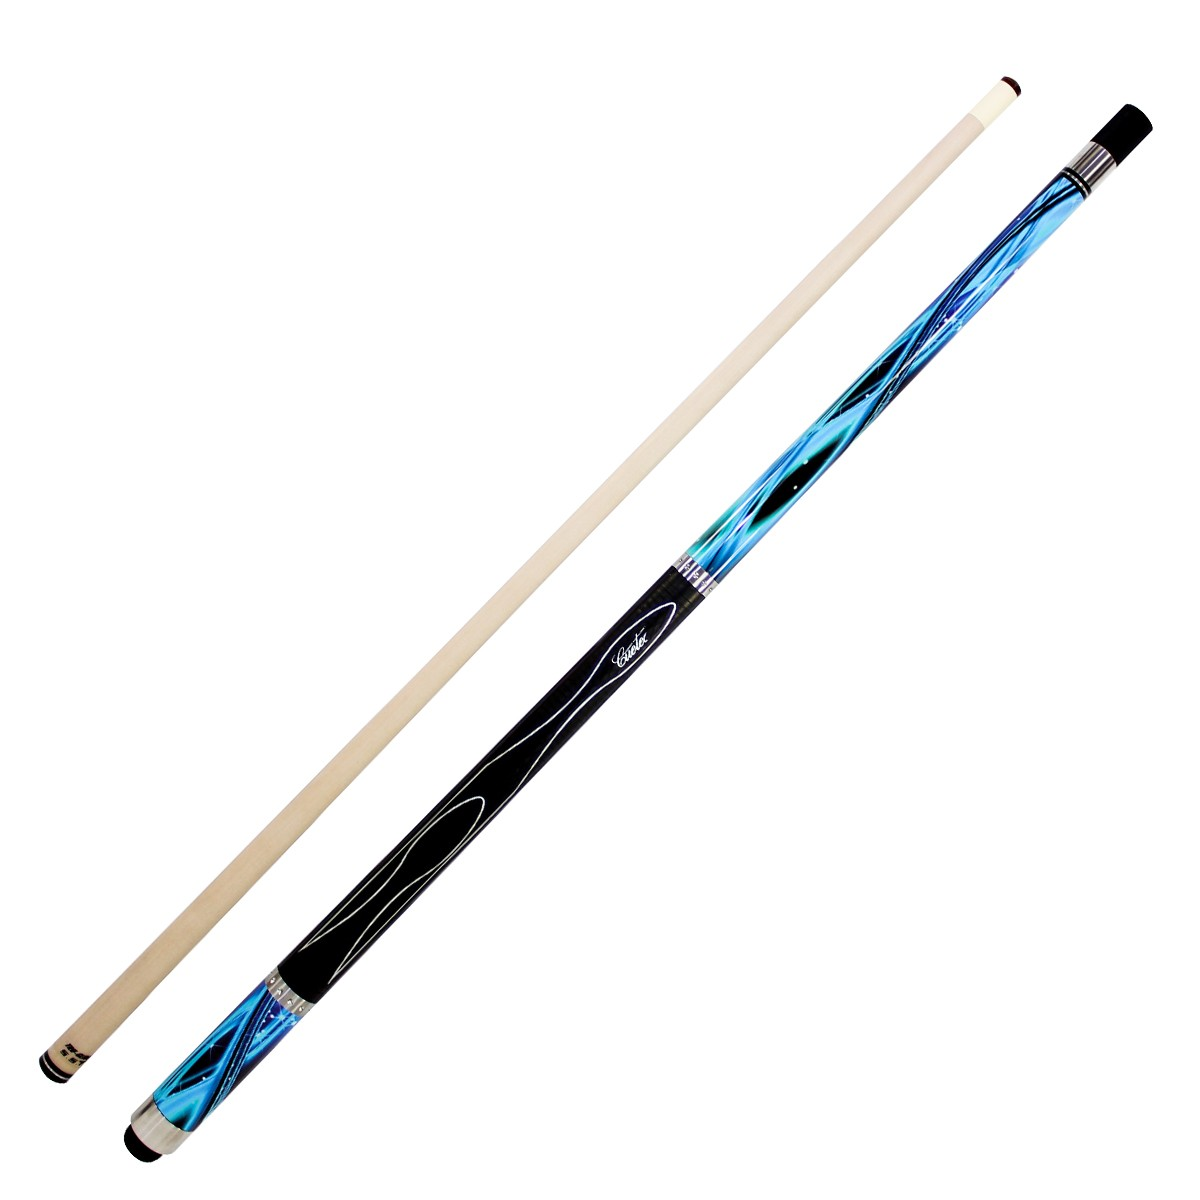 Cue Tek Gen-Tek Cue Stick - Blue Star